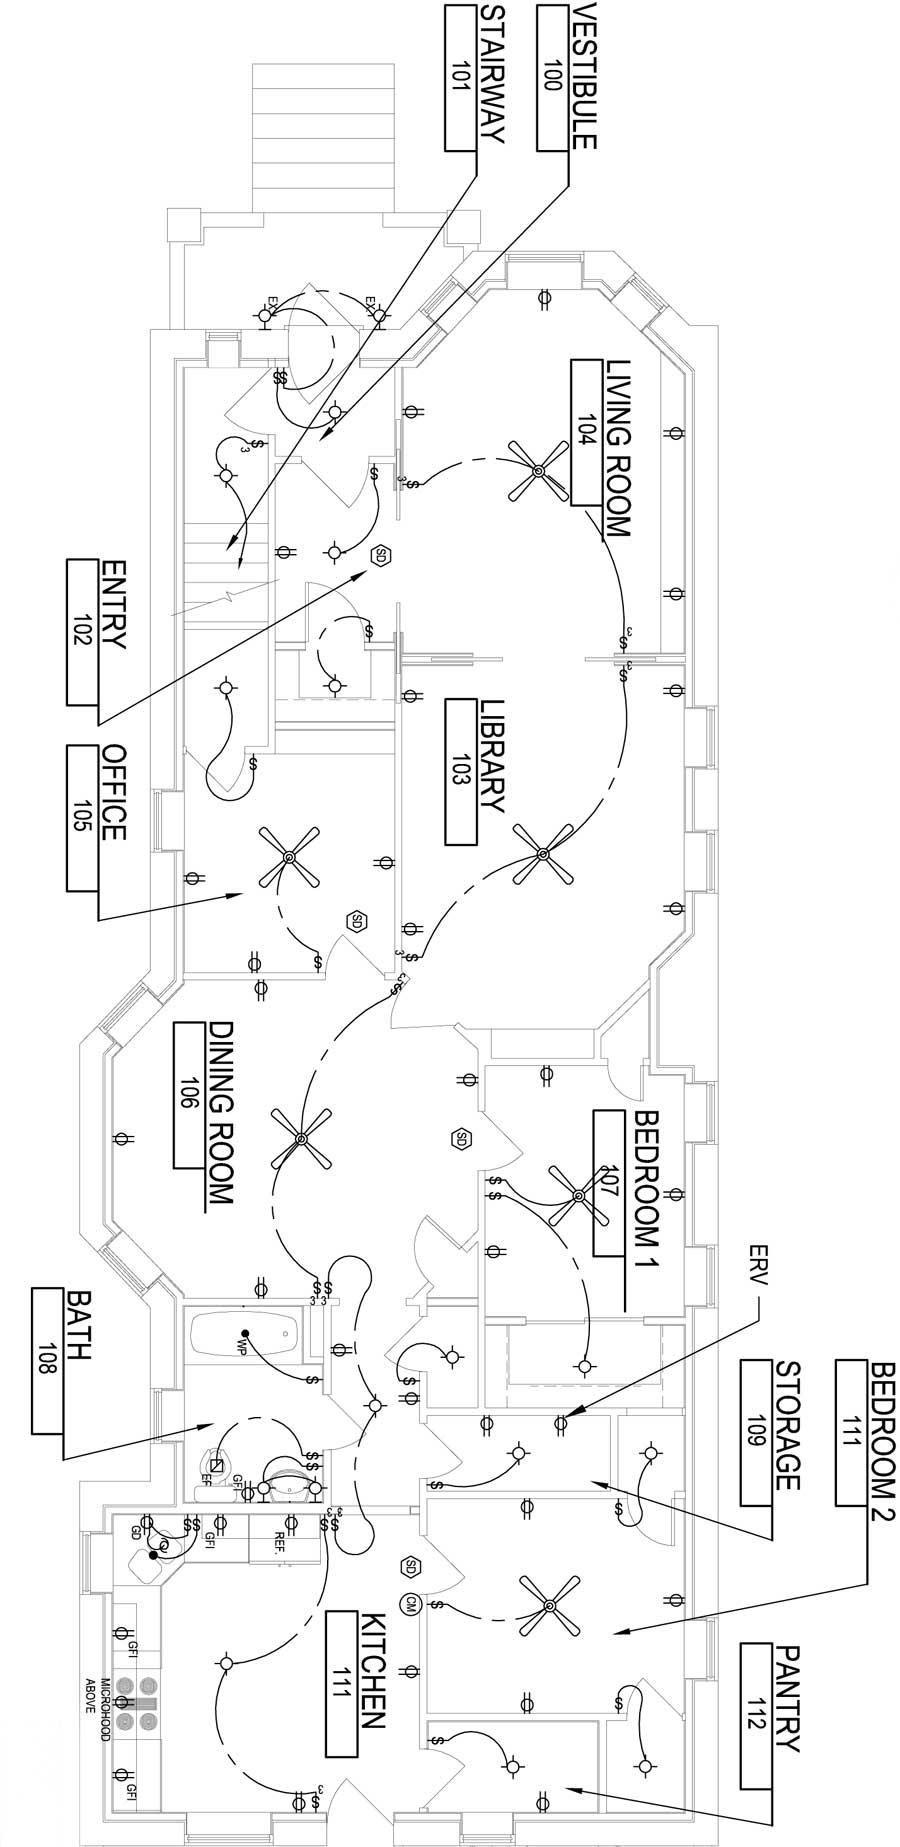 gm_7212] electrical plan view schematic wiring  www mohammedshrine librar wiring 101